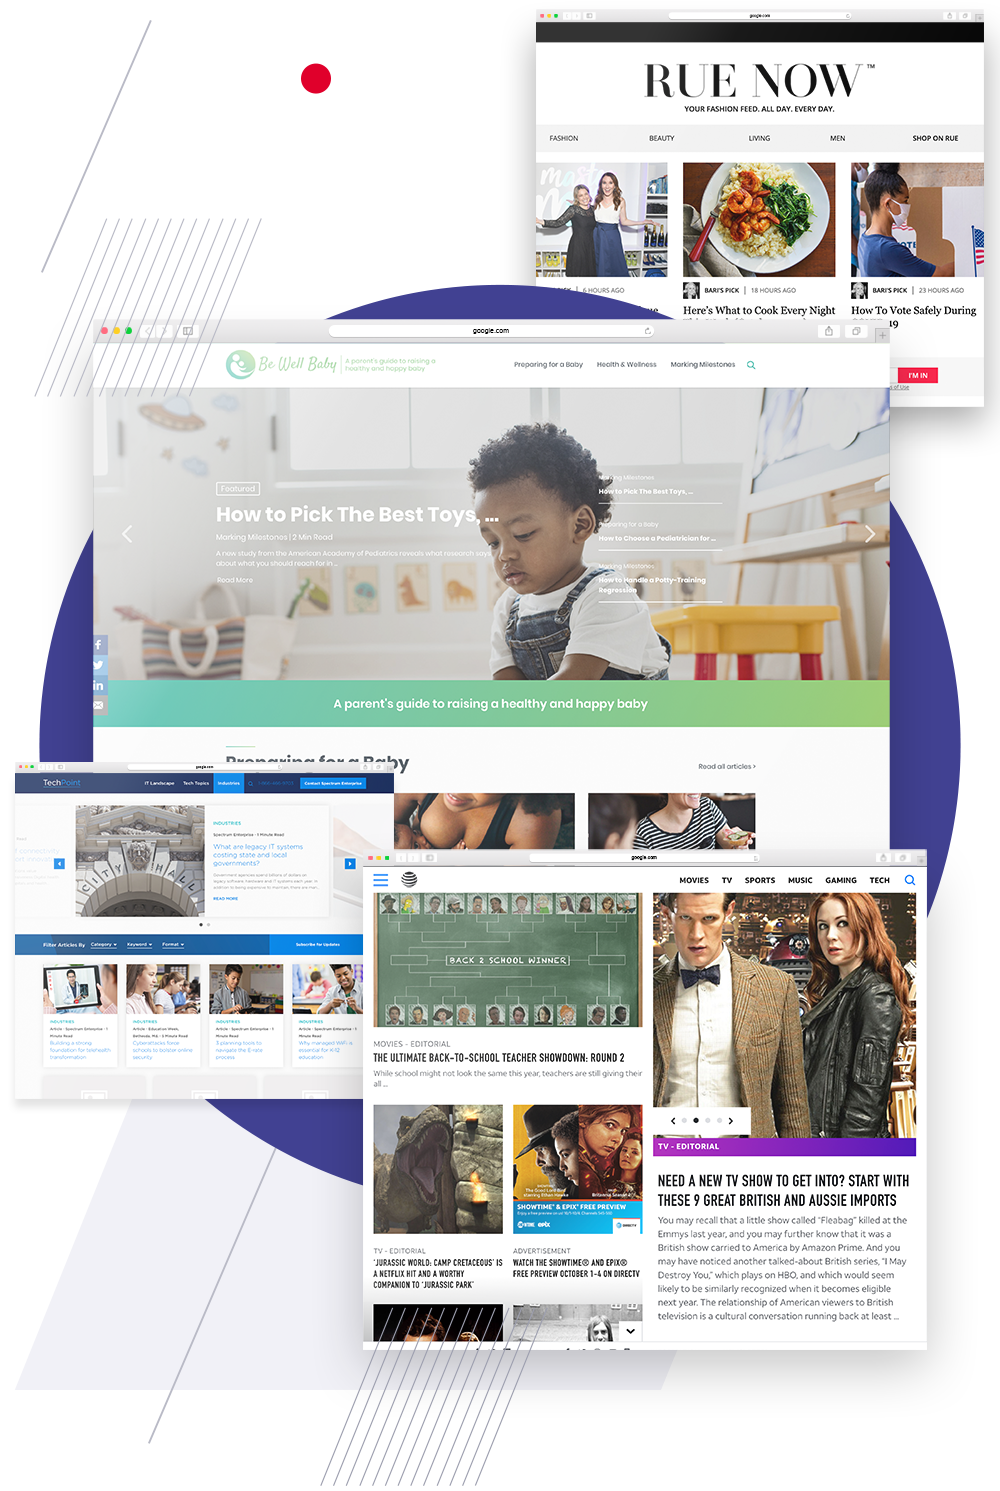 Content marketing optimized hubs